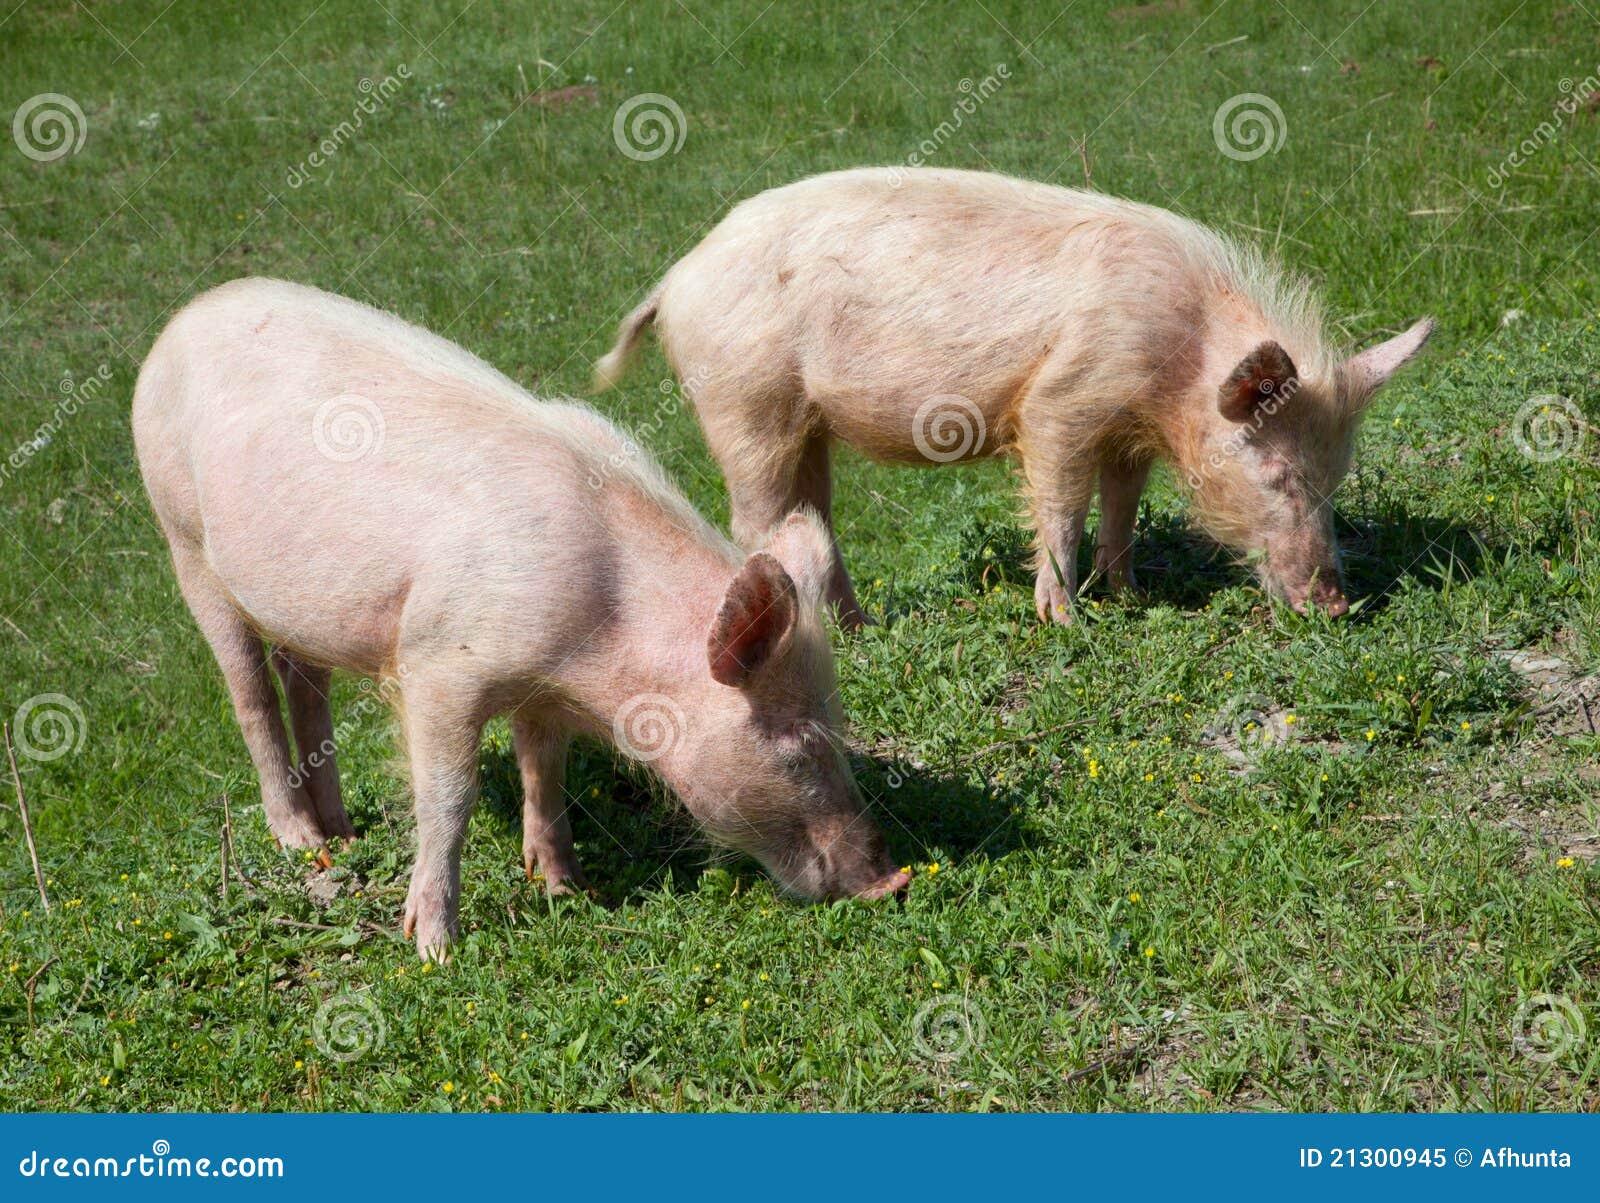 Domestic Pig Royalty Free Stock Photo - Image: 21300945